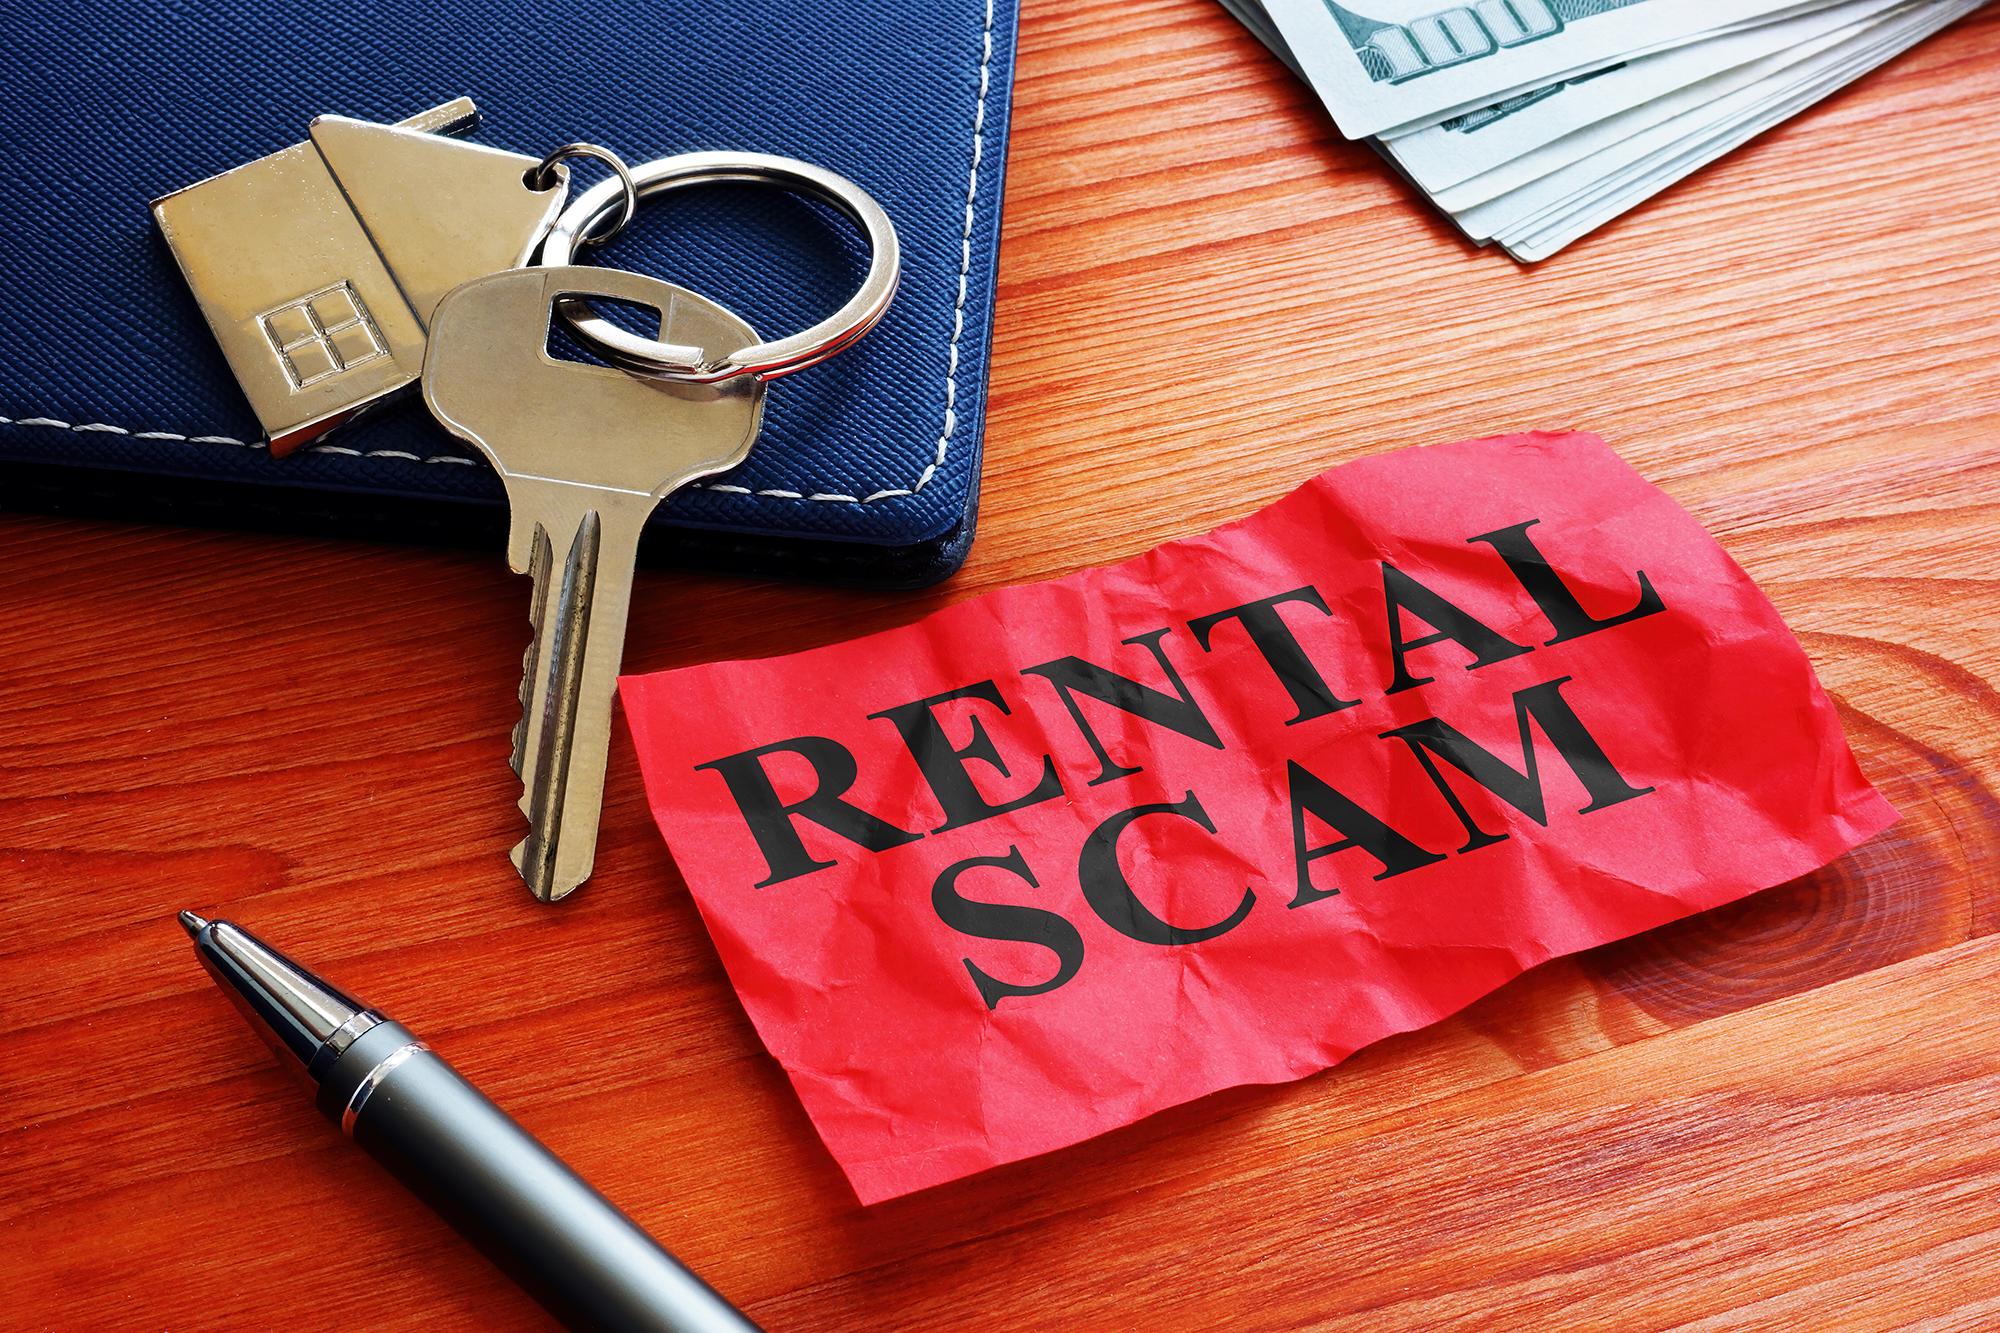 Rental scam warning. (Image: Shutterstock)